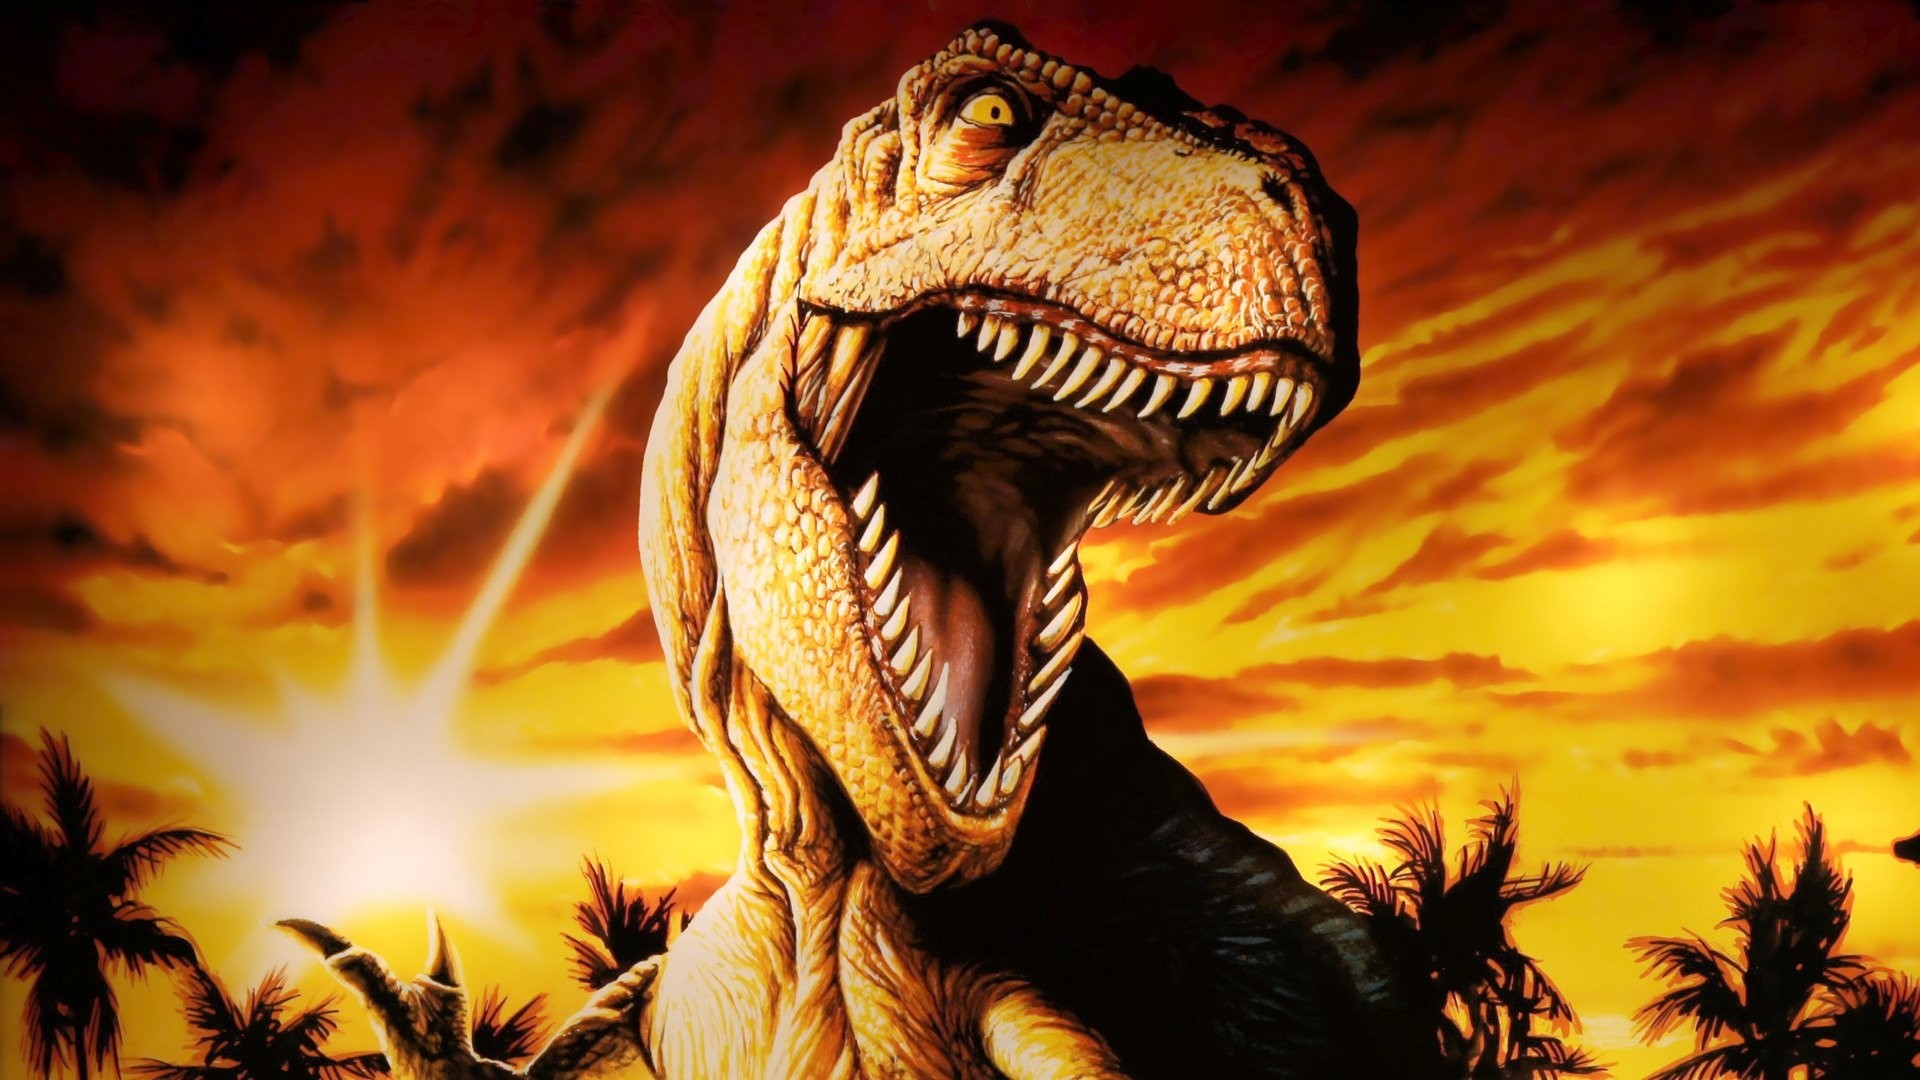 Jurassic World Wallpaper image hd